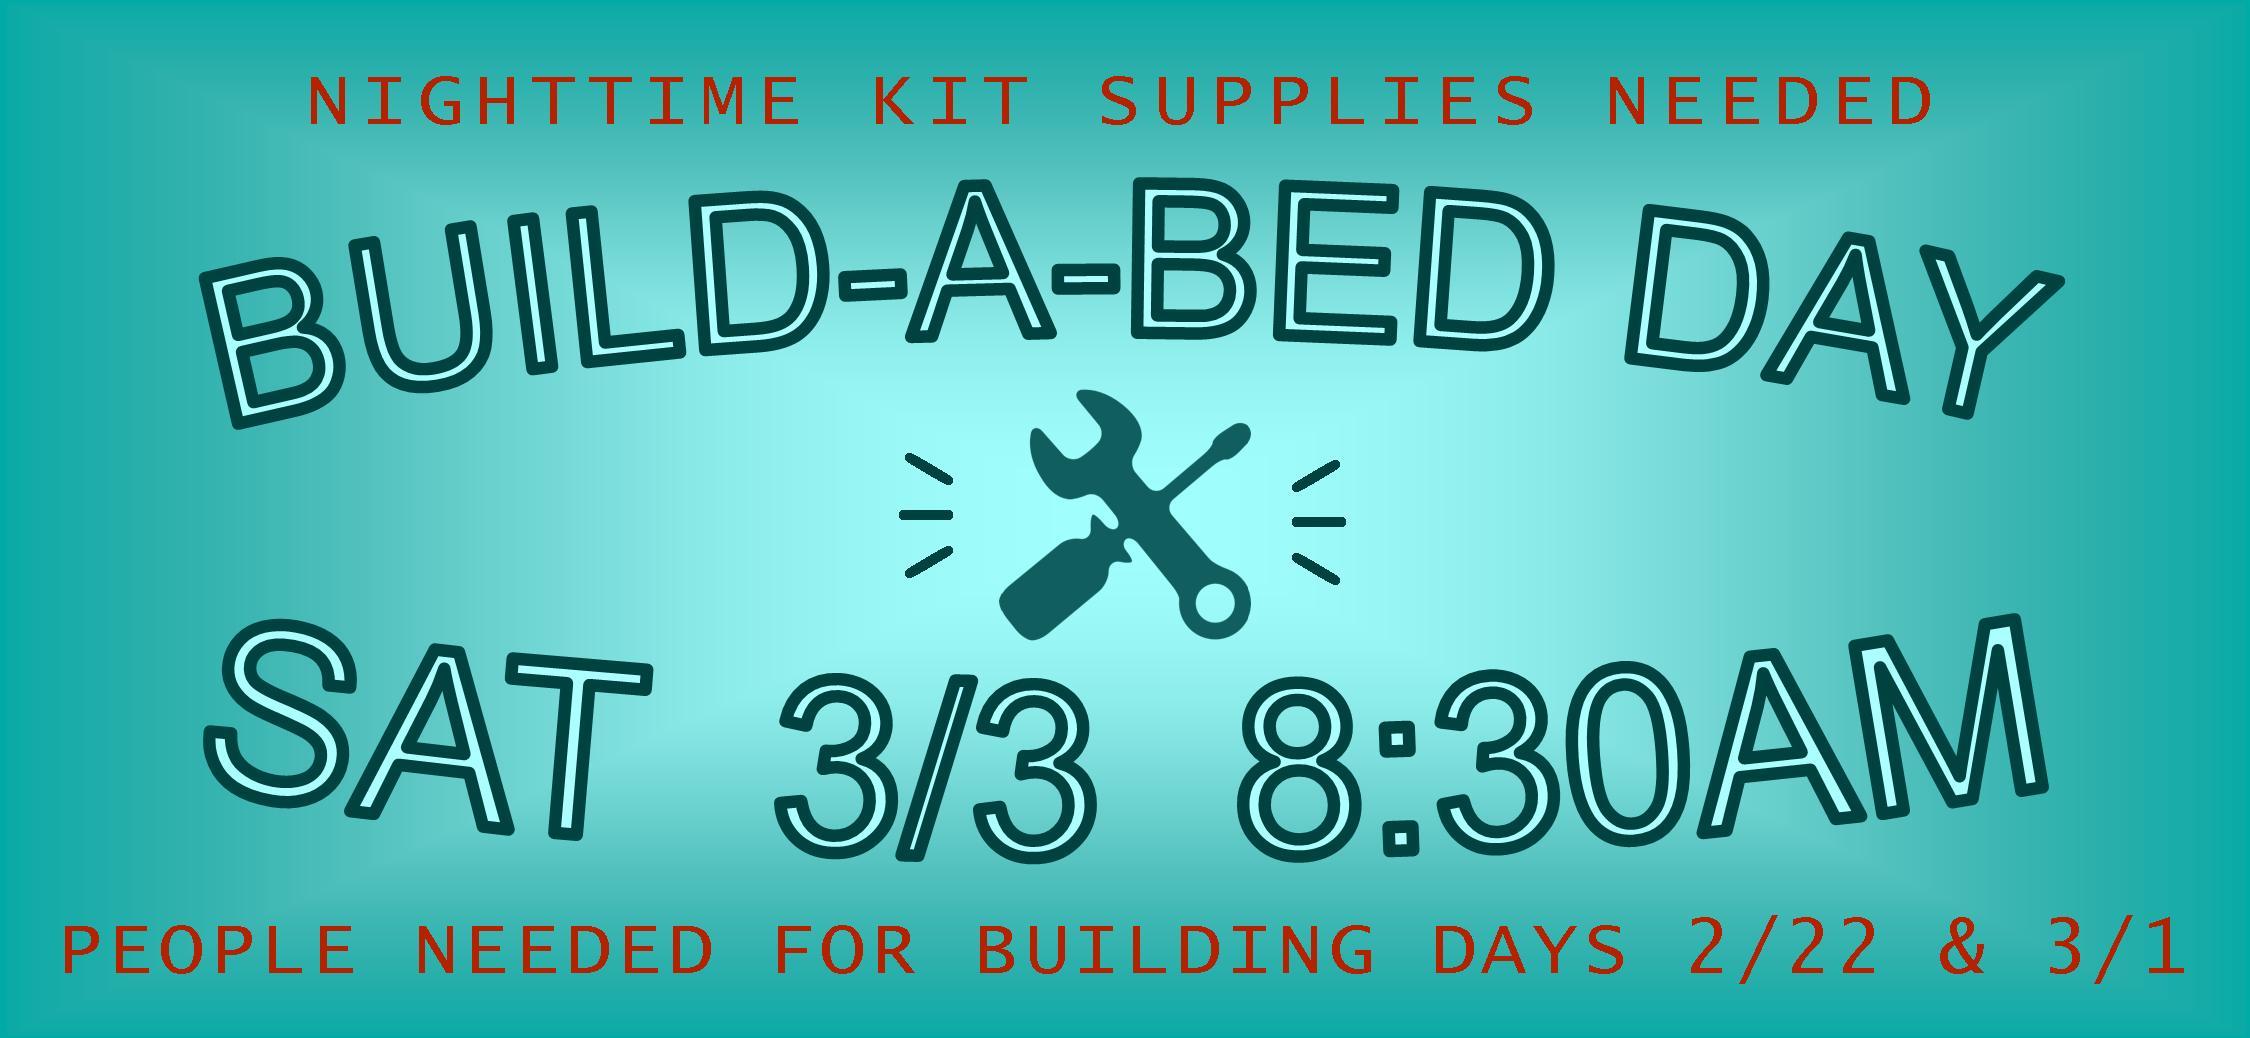 Build A Bed Web Page Slider Art 020618.jpg